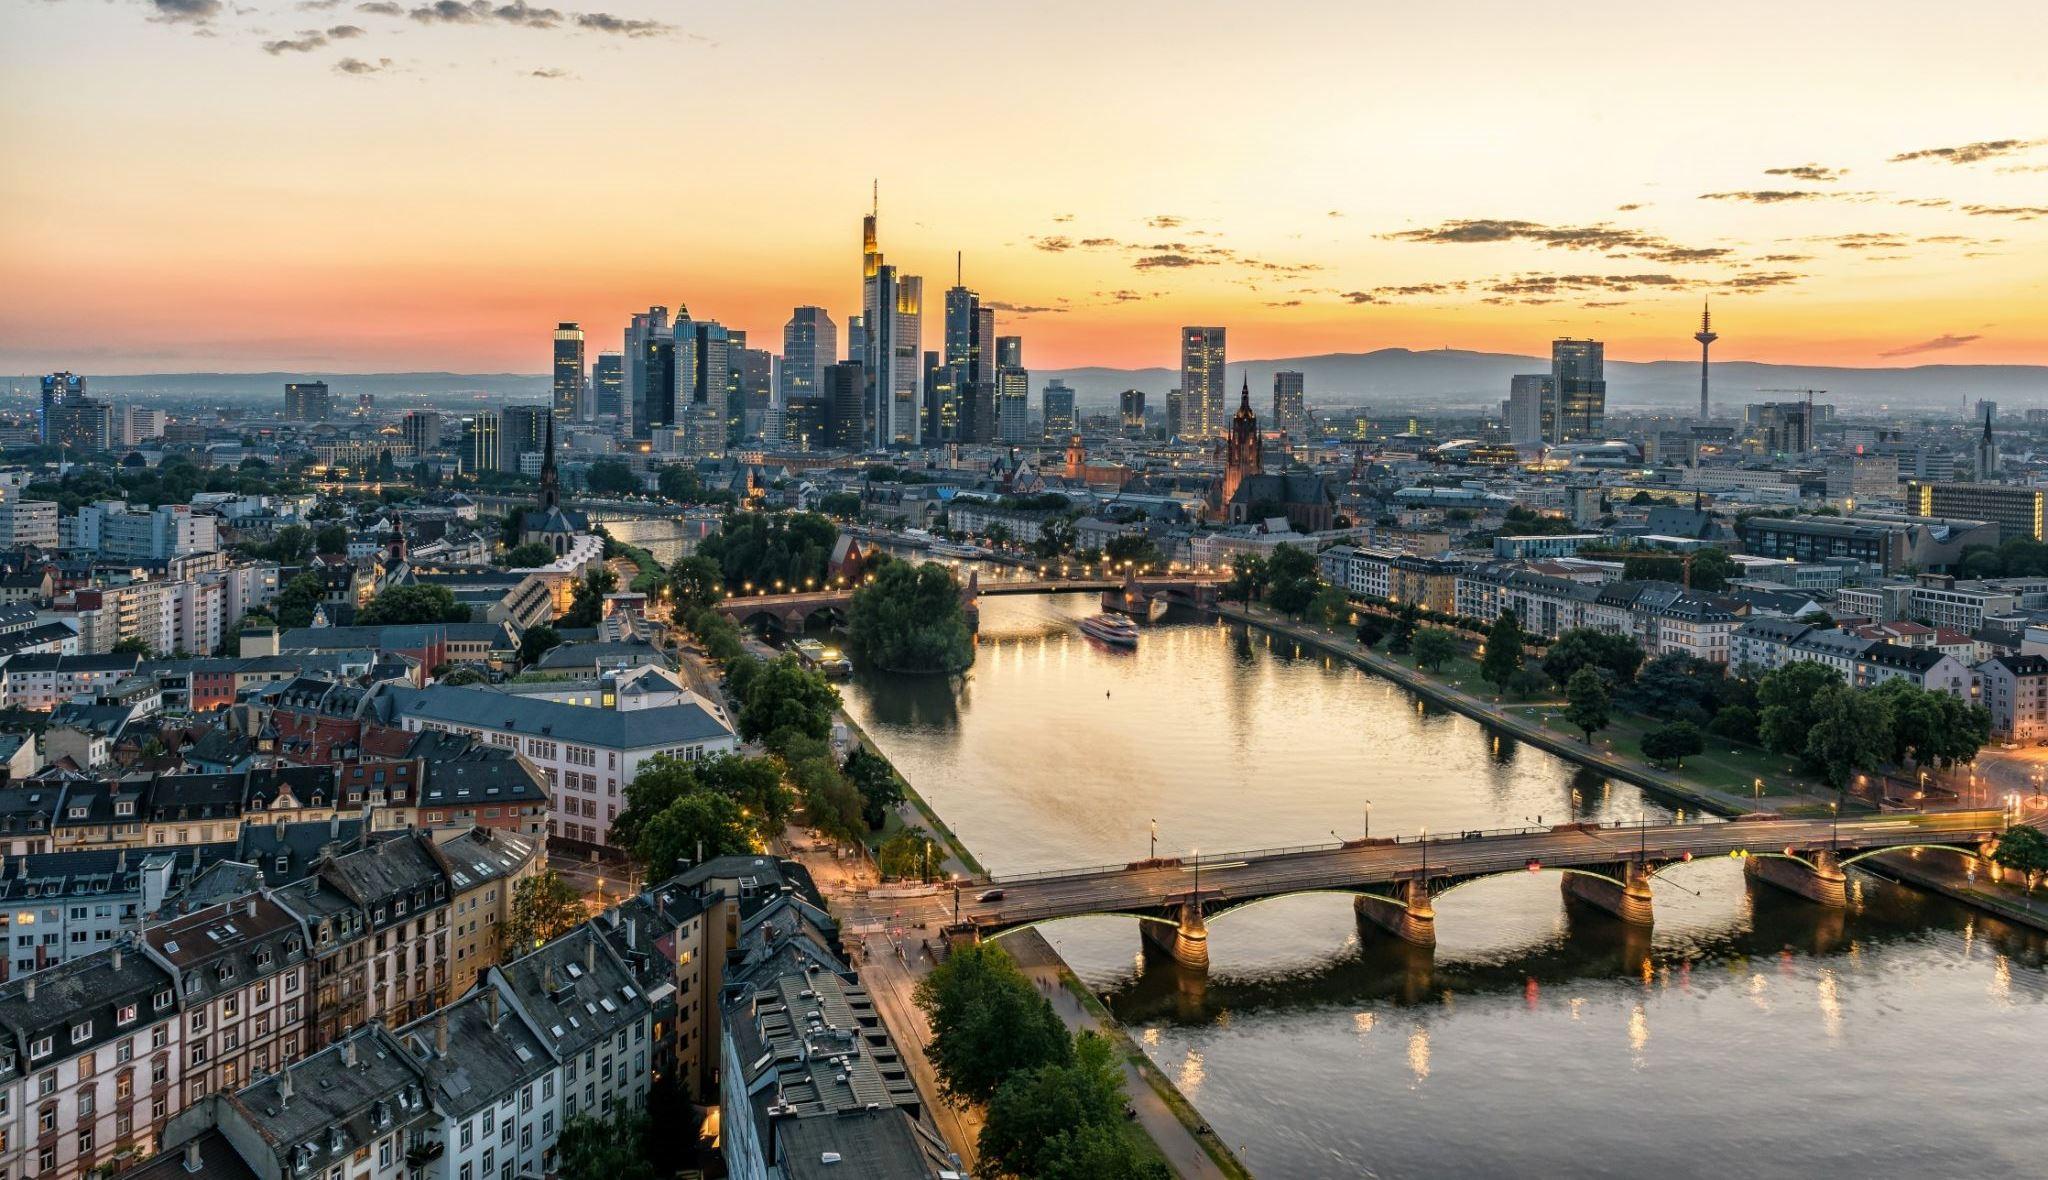 Вечерняя панорама города